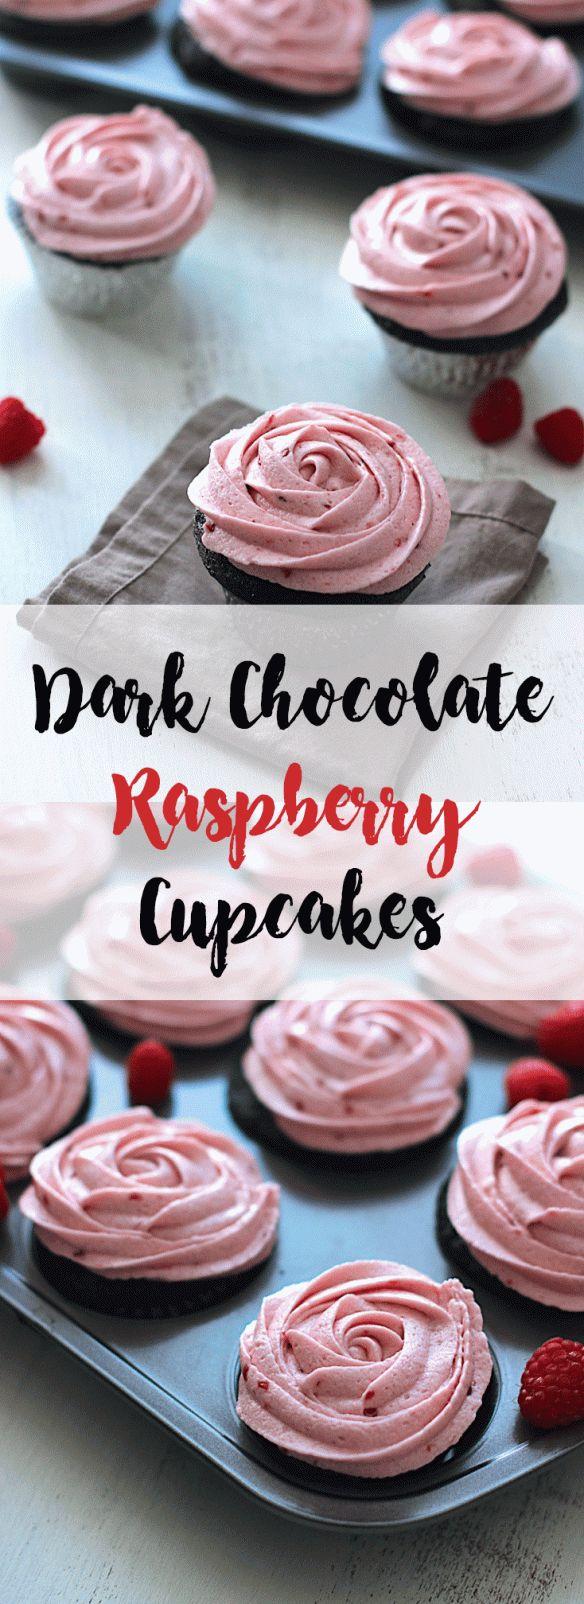 Dark Chocolate Raspberry Cupcakes | A Nerd Cooks